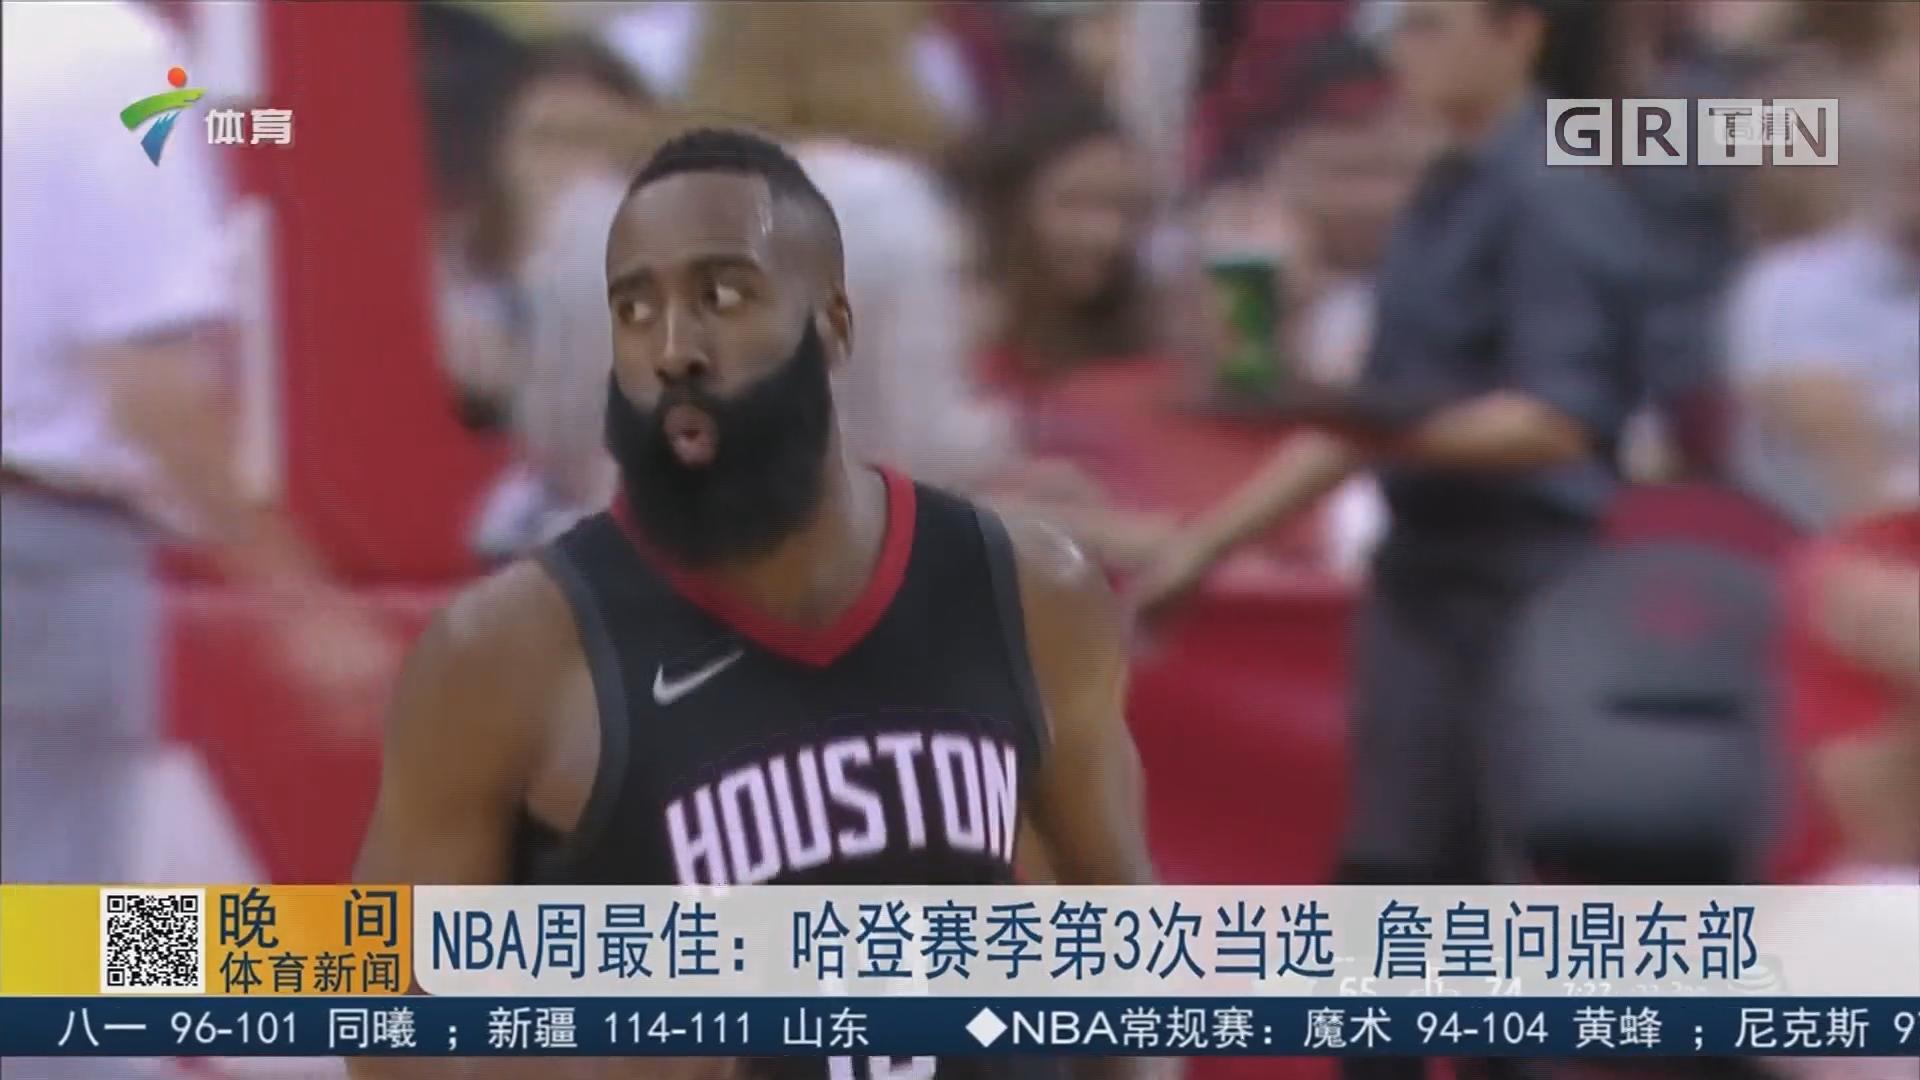 NBA周最佳:哈登赛季第3次当选 詹皇问鼎东部